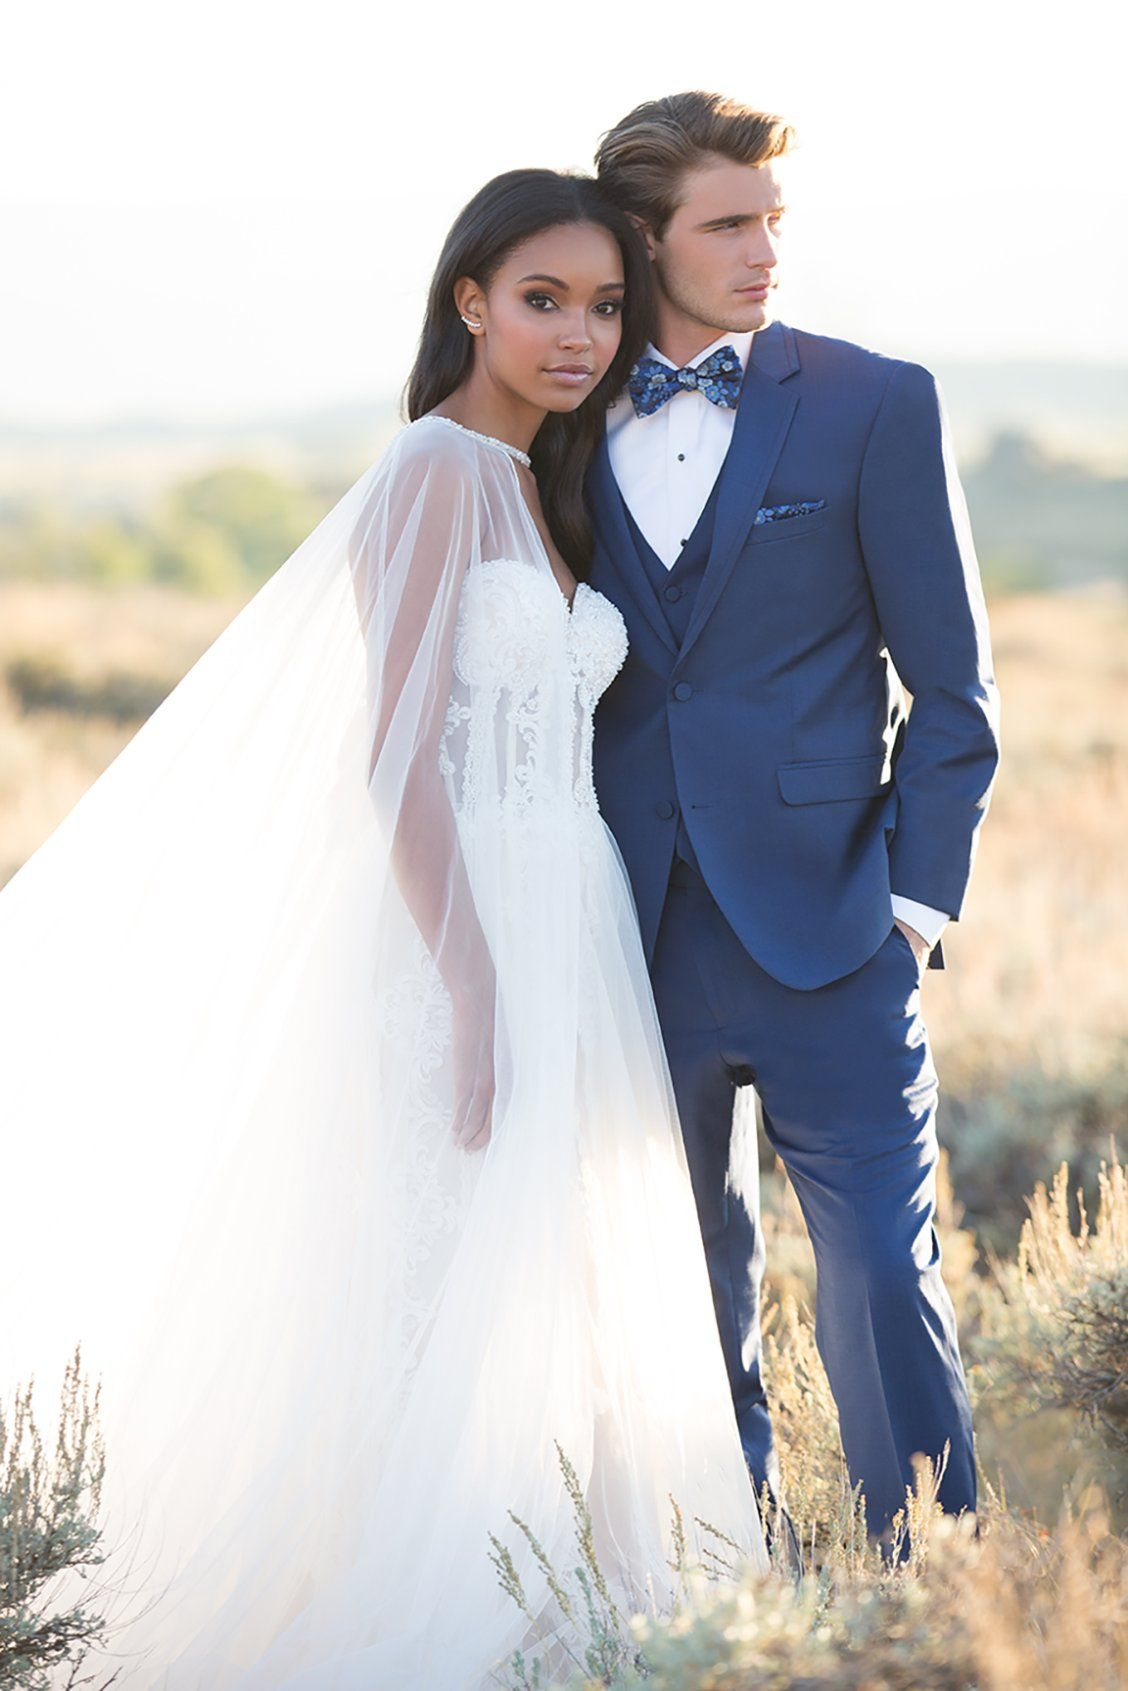 Gorgeous Interracial Couple On Their Wedding Day Love  -1732